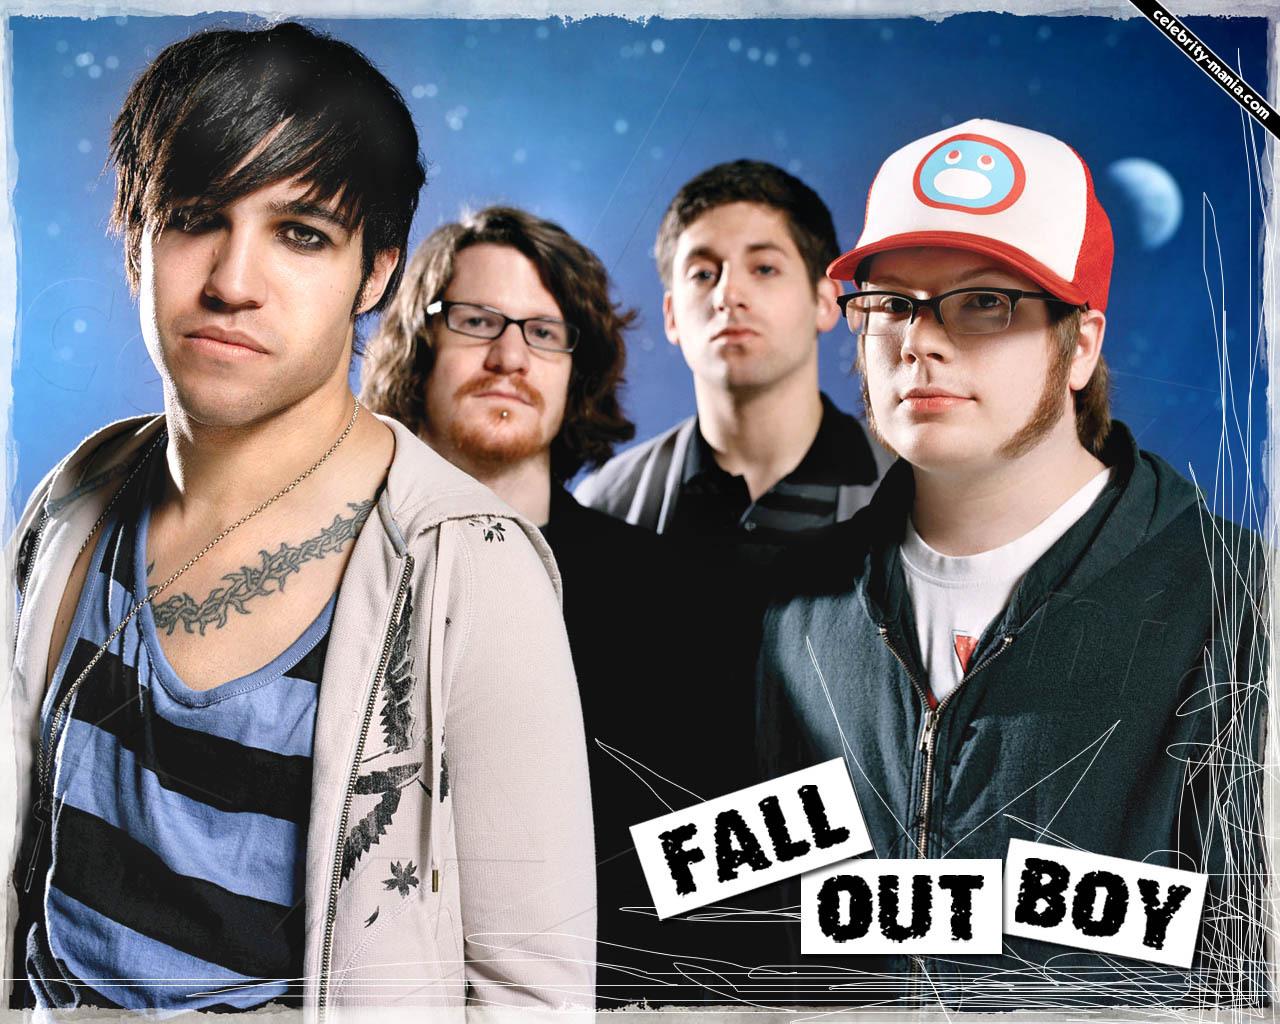 Fall Out Boy Song Lyrics Wallpaper Fall Out Boy Lyrics Quiz